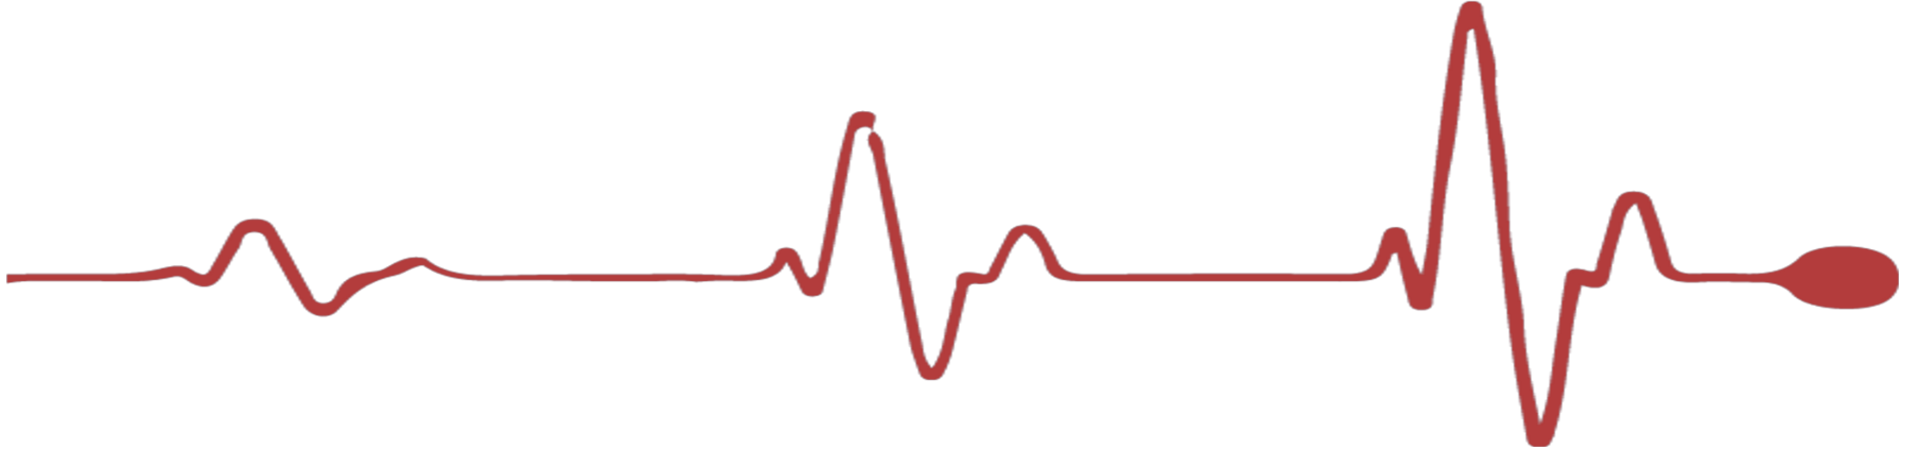 Lines clipart heart beat Clipart Heartbeat Clipart Cliparts Line